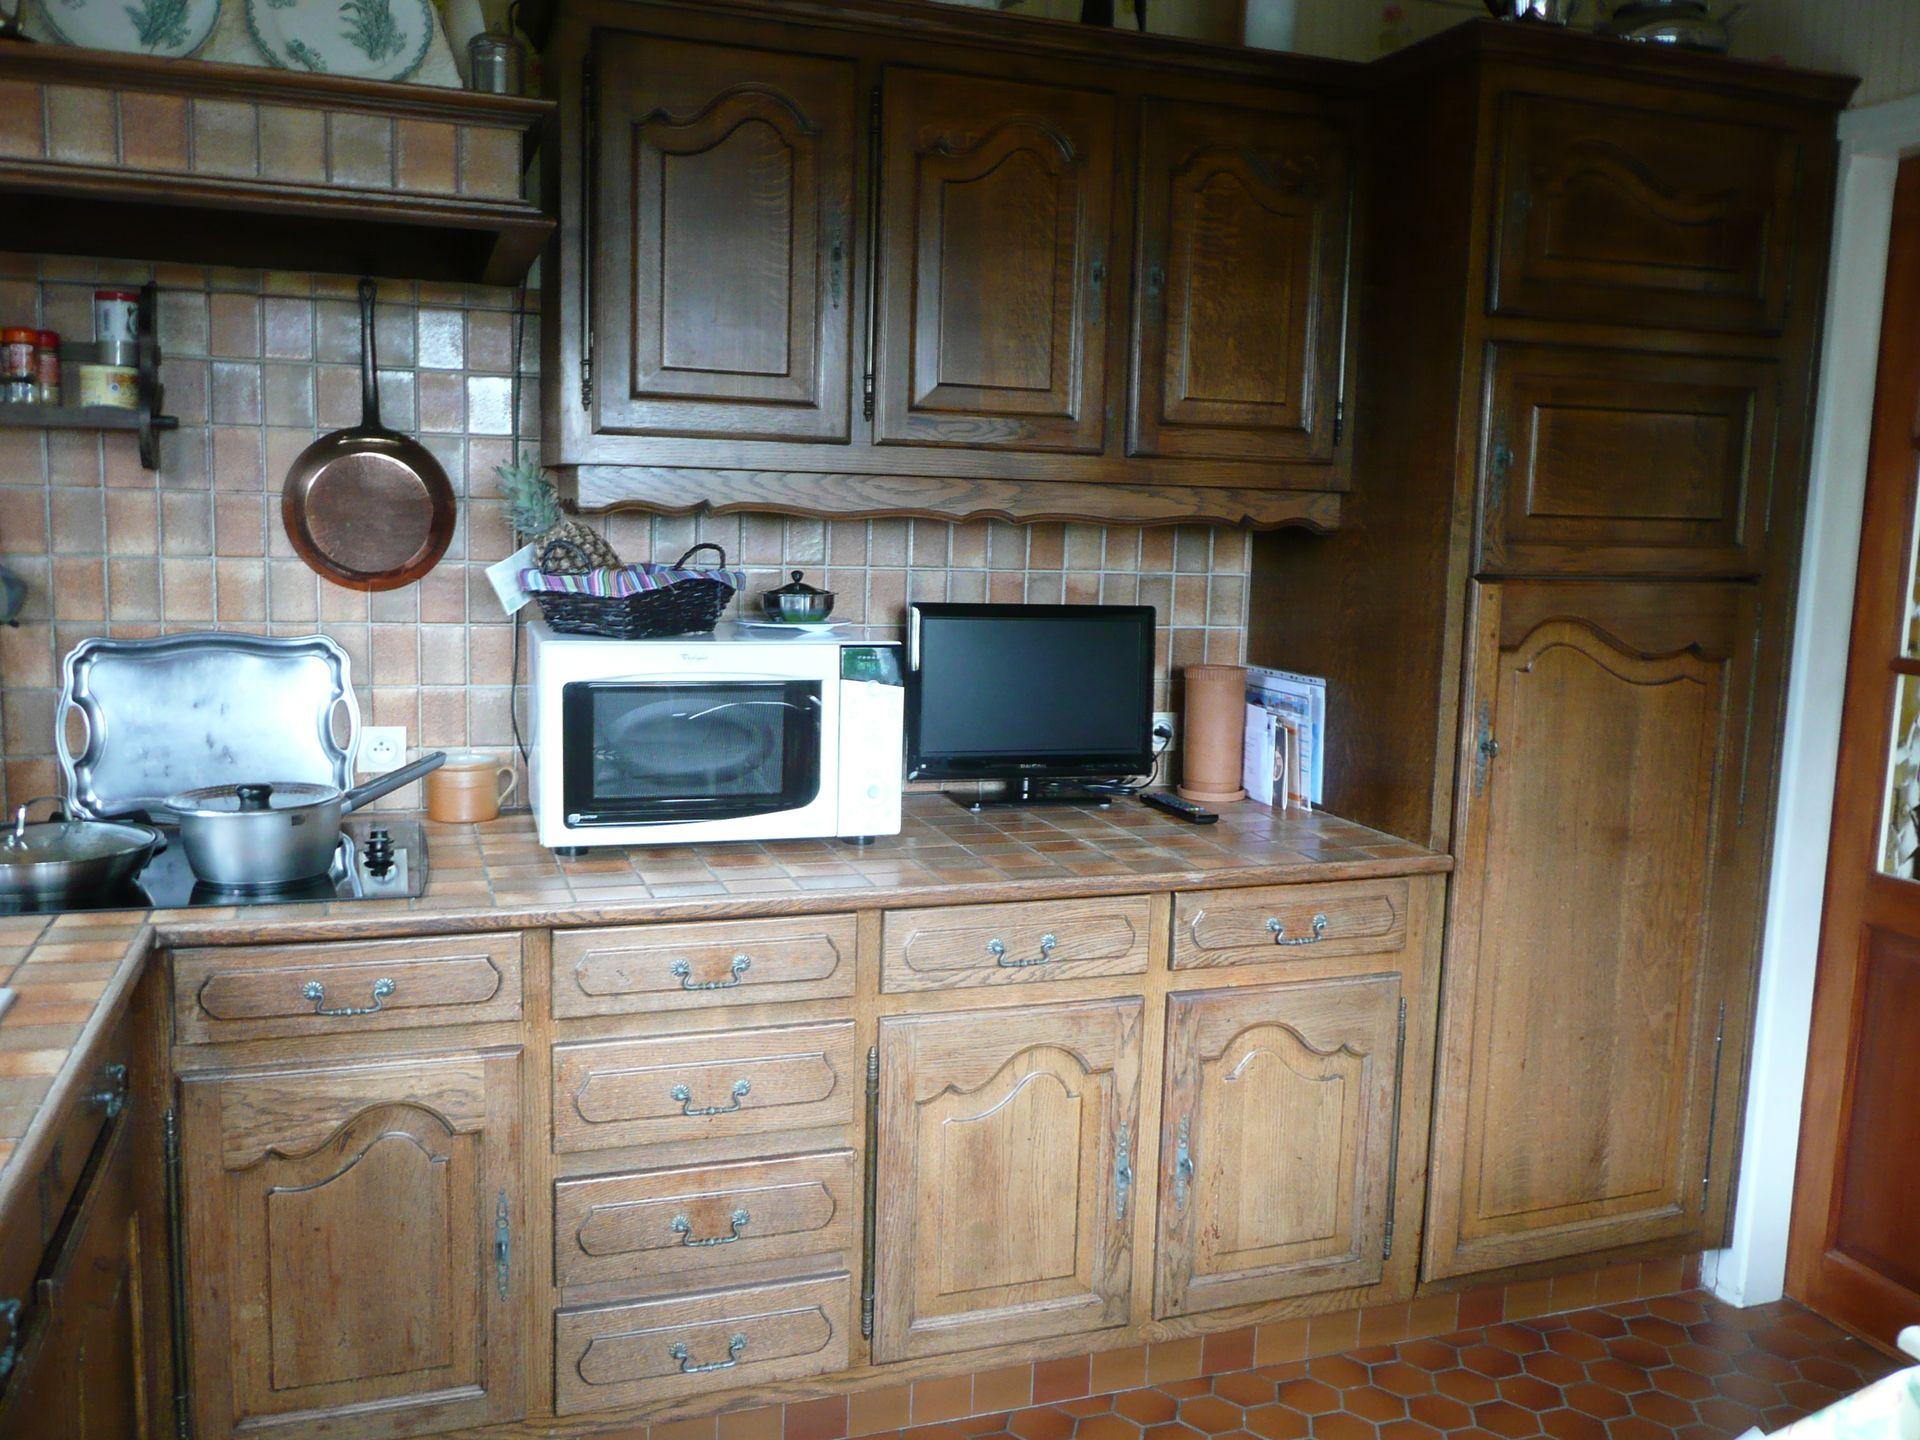 cuisine champagne ocre patine ch ne fonc gilles martel. Black Bedroom Furniture Sets. Home Design Ideas